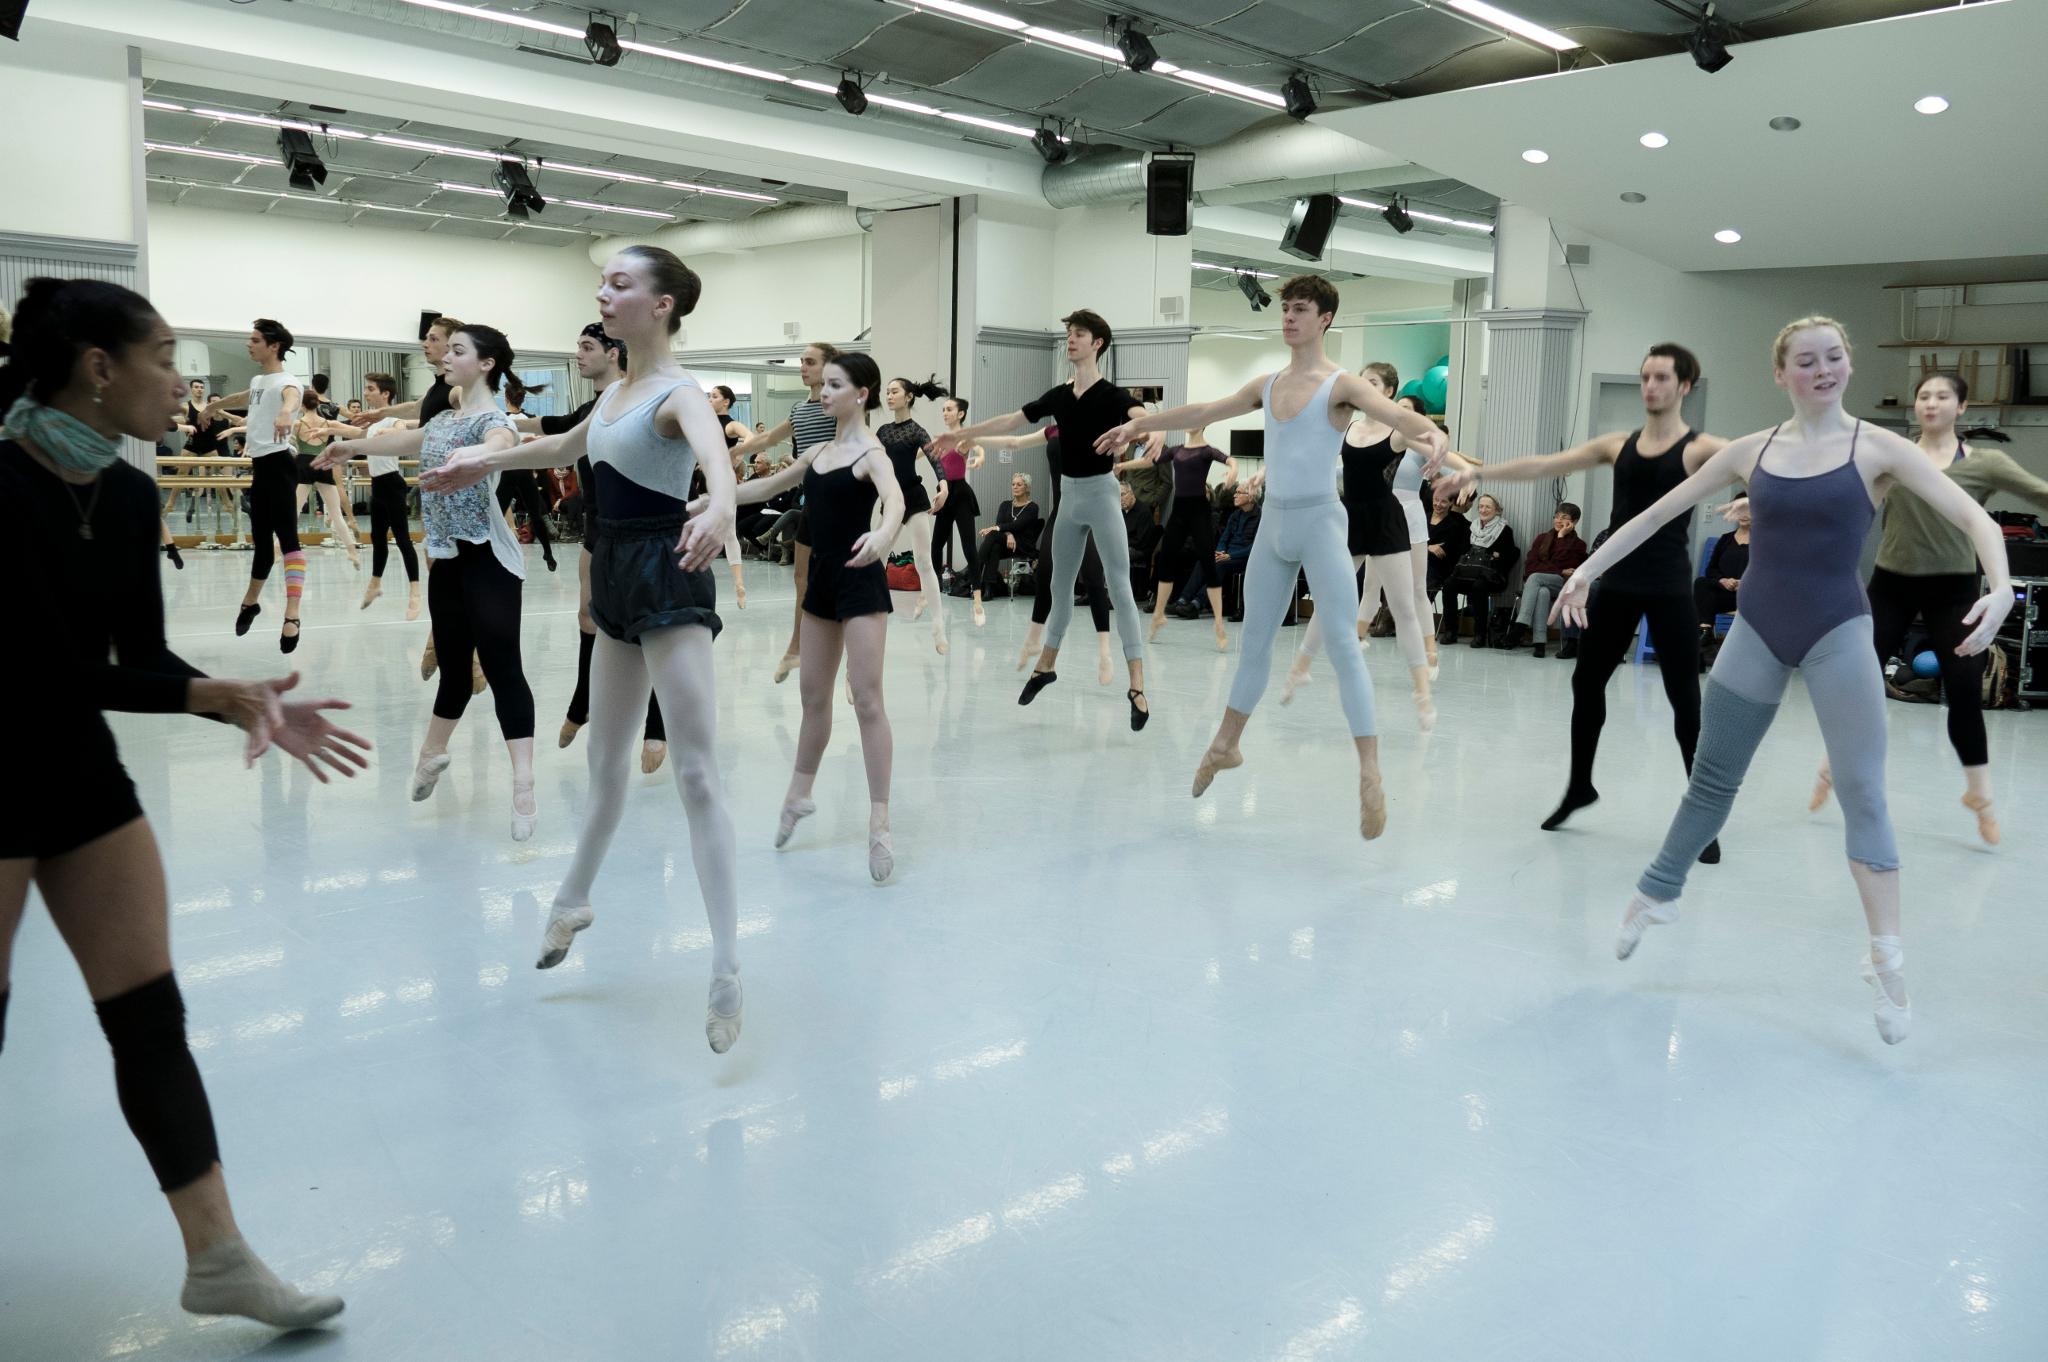 Tanztraining in der HfMDK